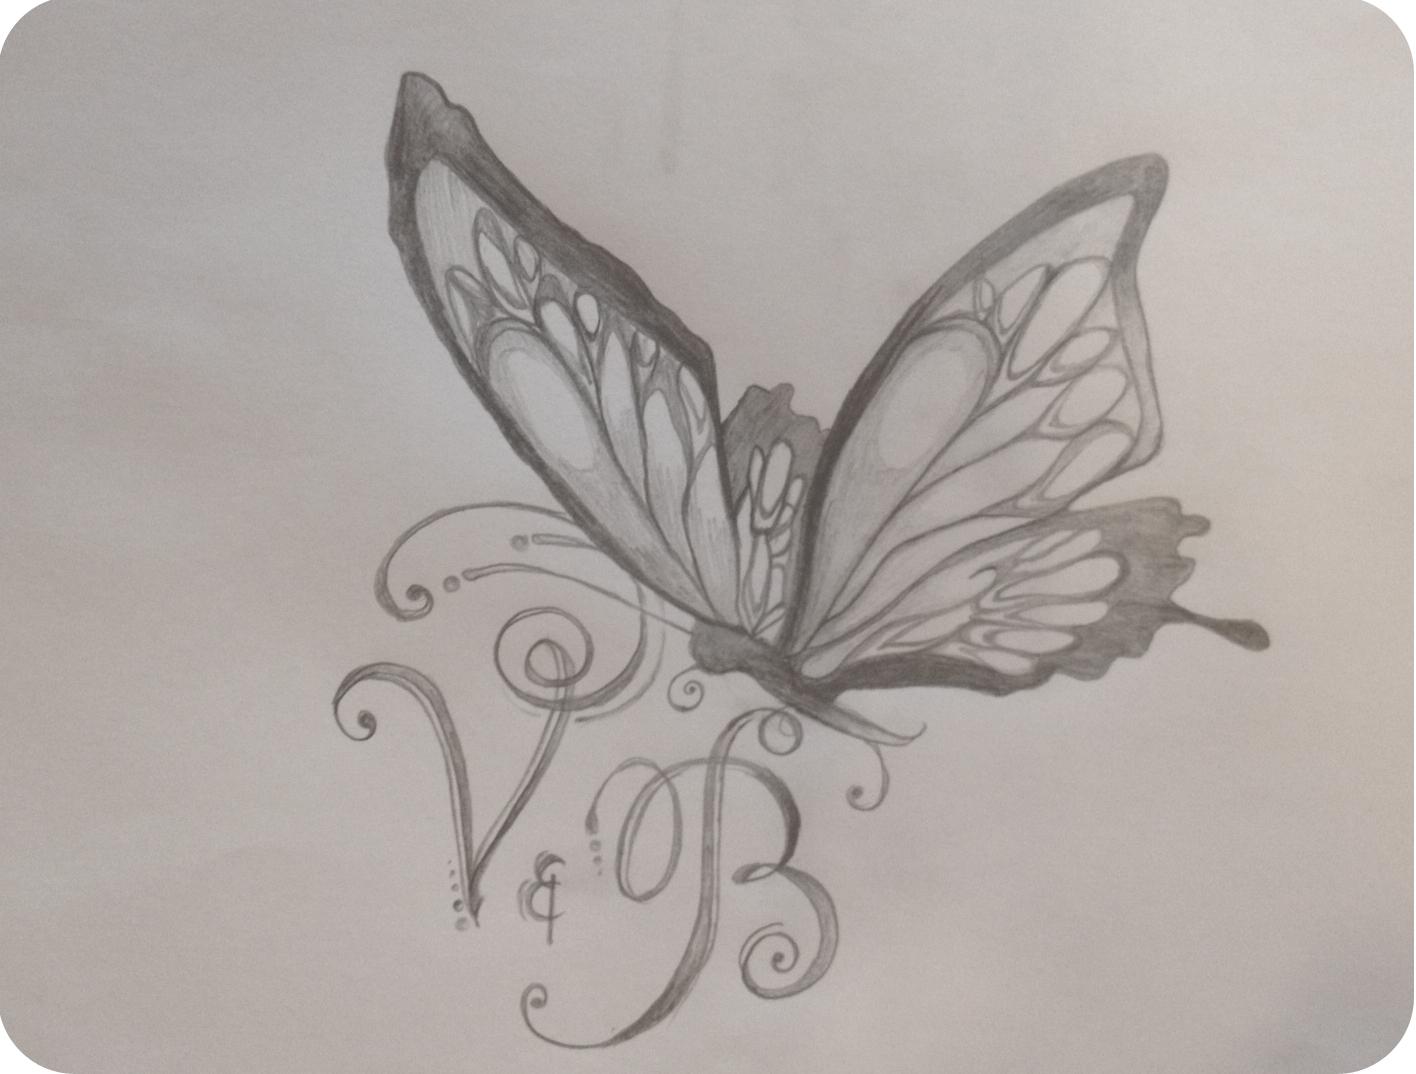 Efterstræbte Minimuffs Beautyblog ♥: TATTOO zeichnen | Butterfly Letters CG-16